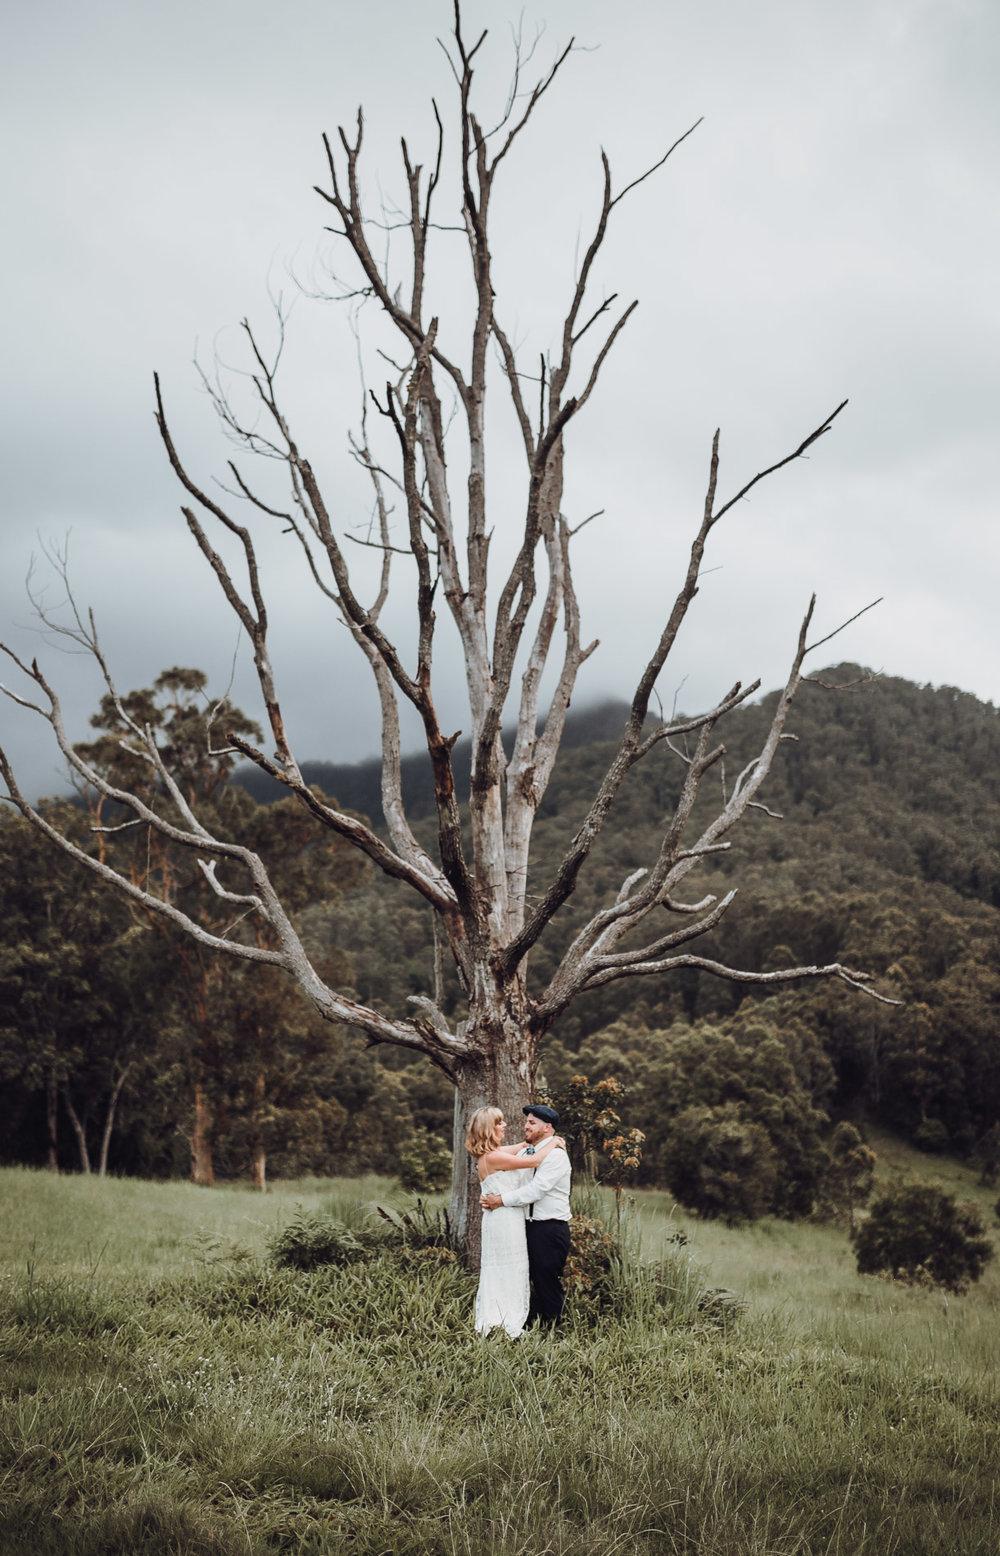 True North Photography_Jess and cott_Midjimbil Hill_Northern NSW_Mt Warning wedding_Crams Farm Wedding_Barm Wedding-169.jpg